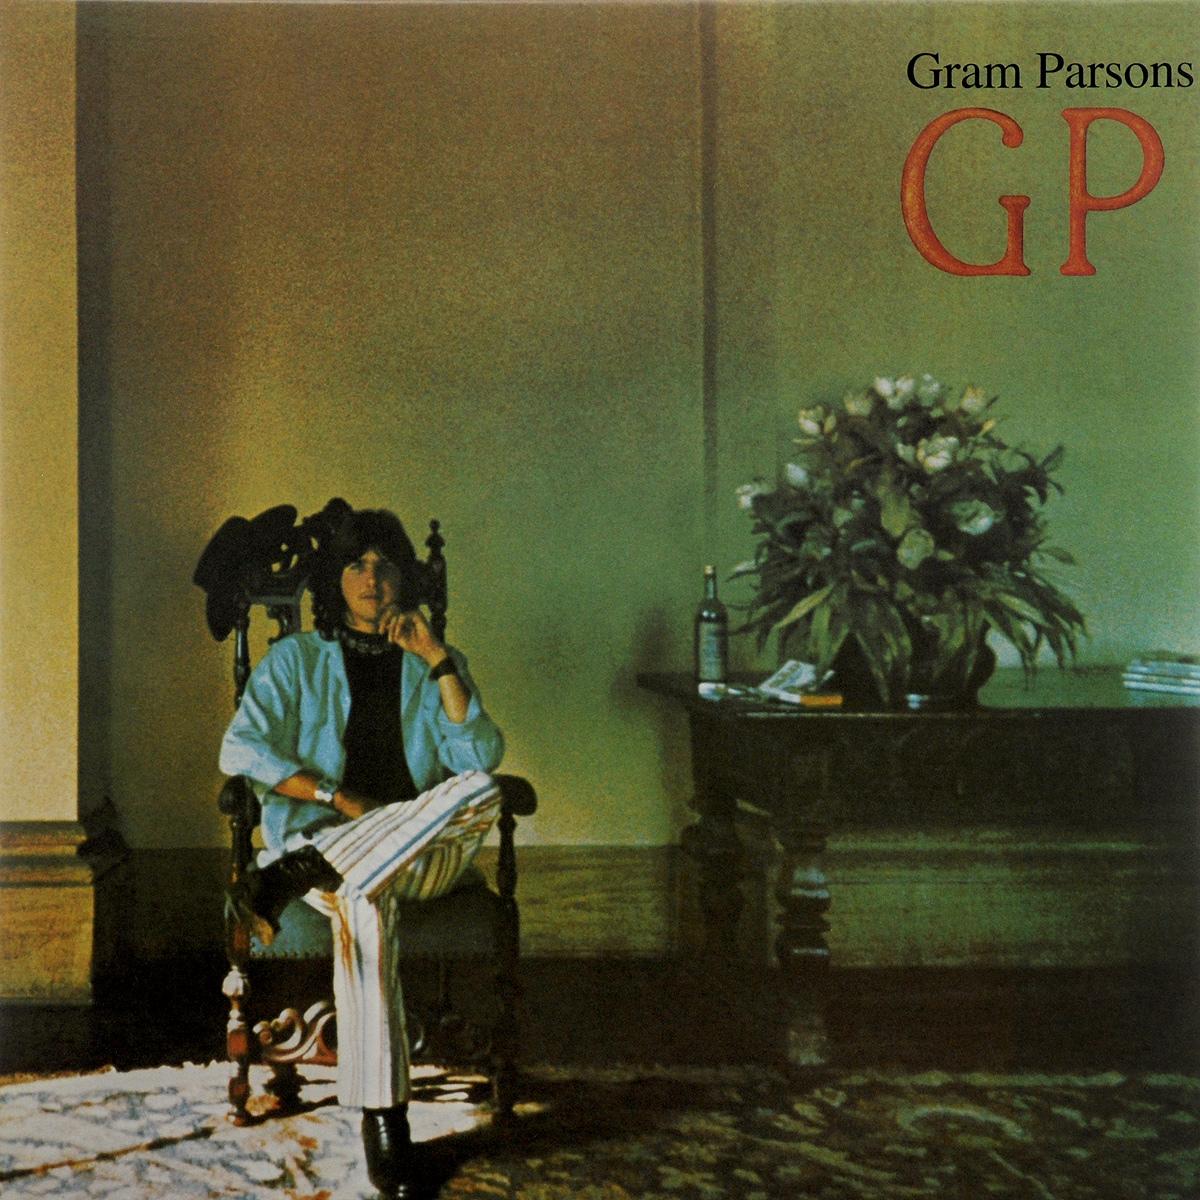 Грэм Парсонс Gram Parsons. GP (LP) 50 clay composite striped dice 11 5 gram poker chips by brybelly